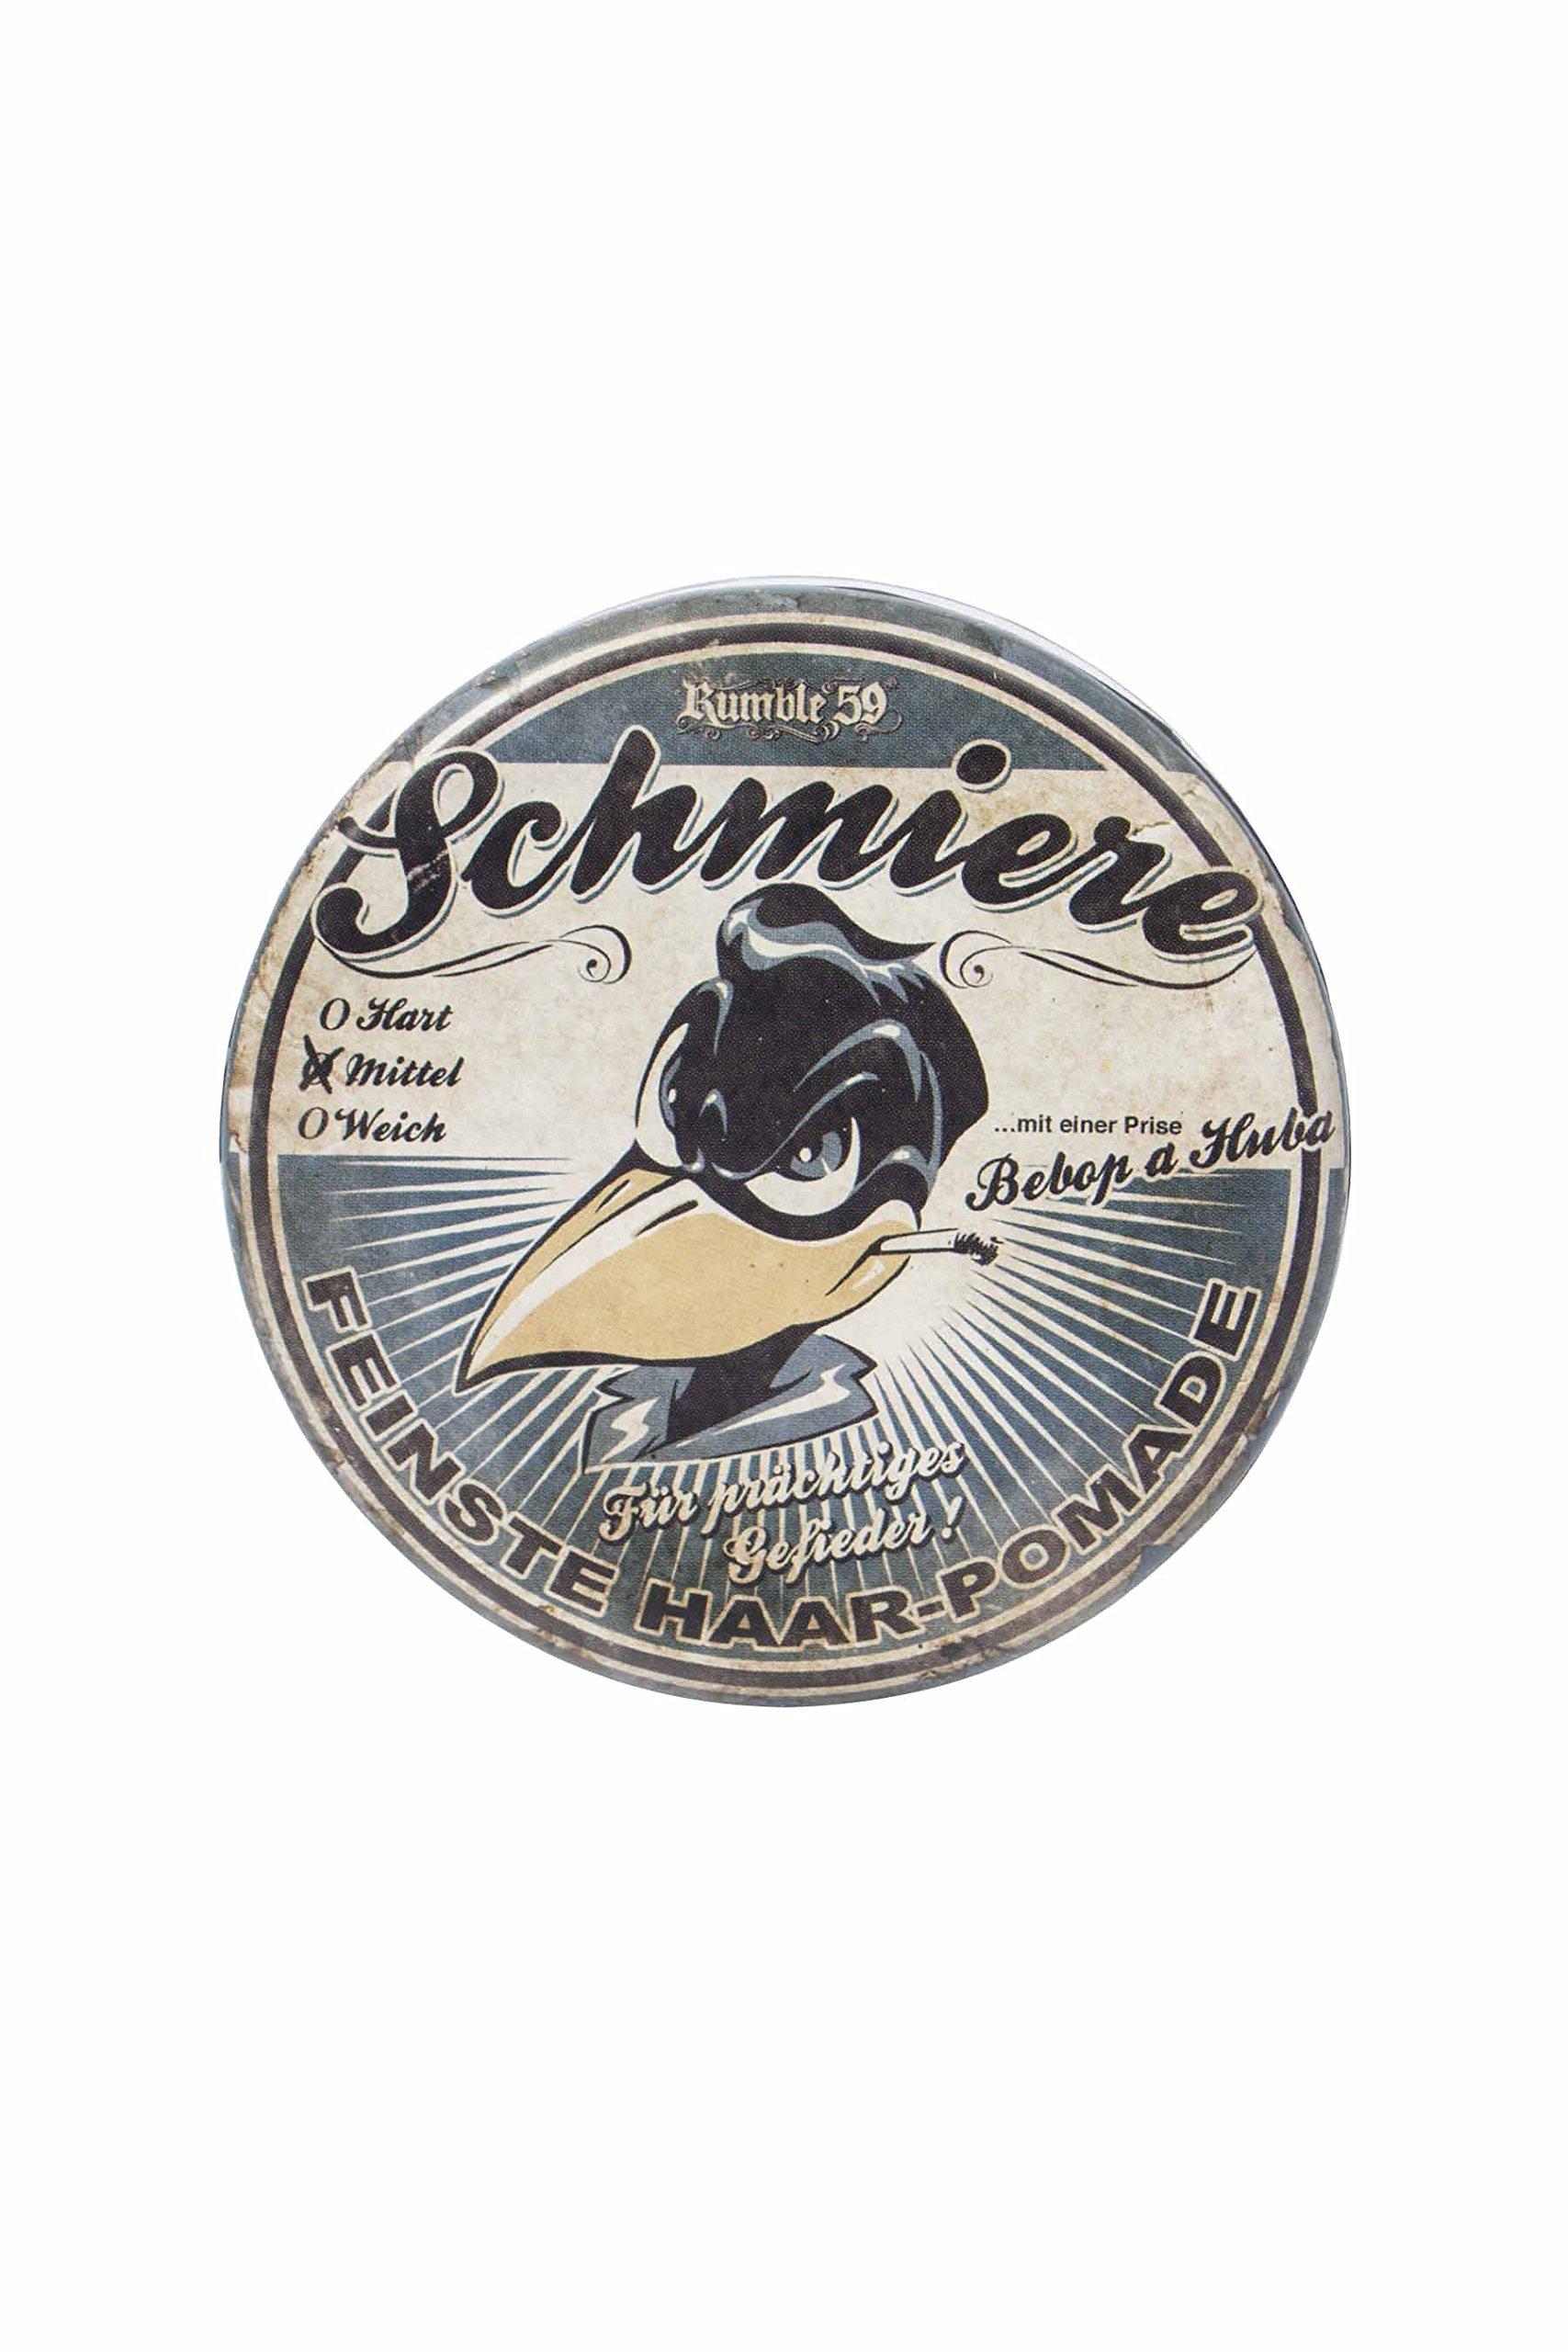 Schmiere special edition gambling medium slotomania casino